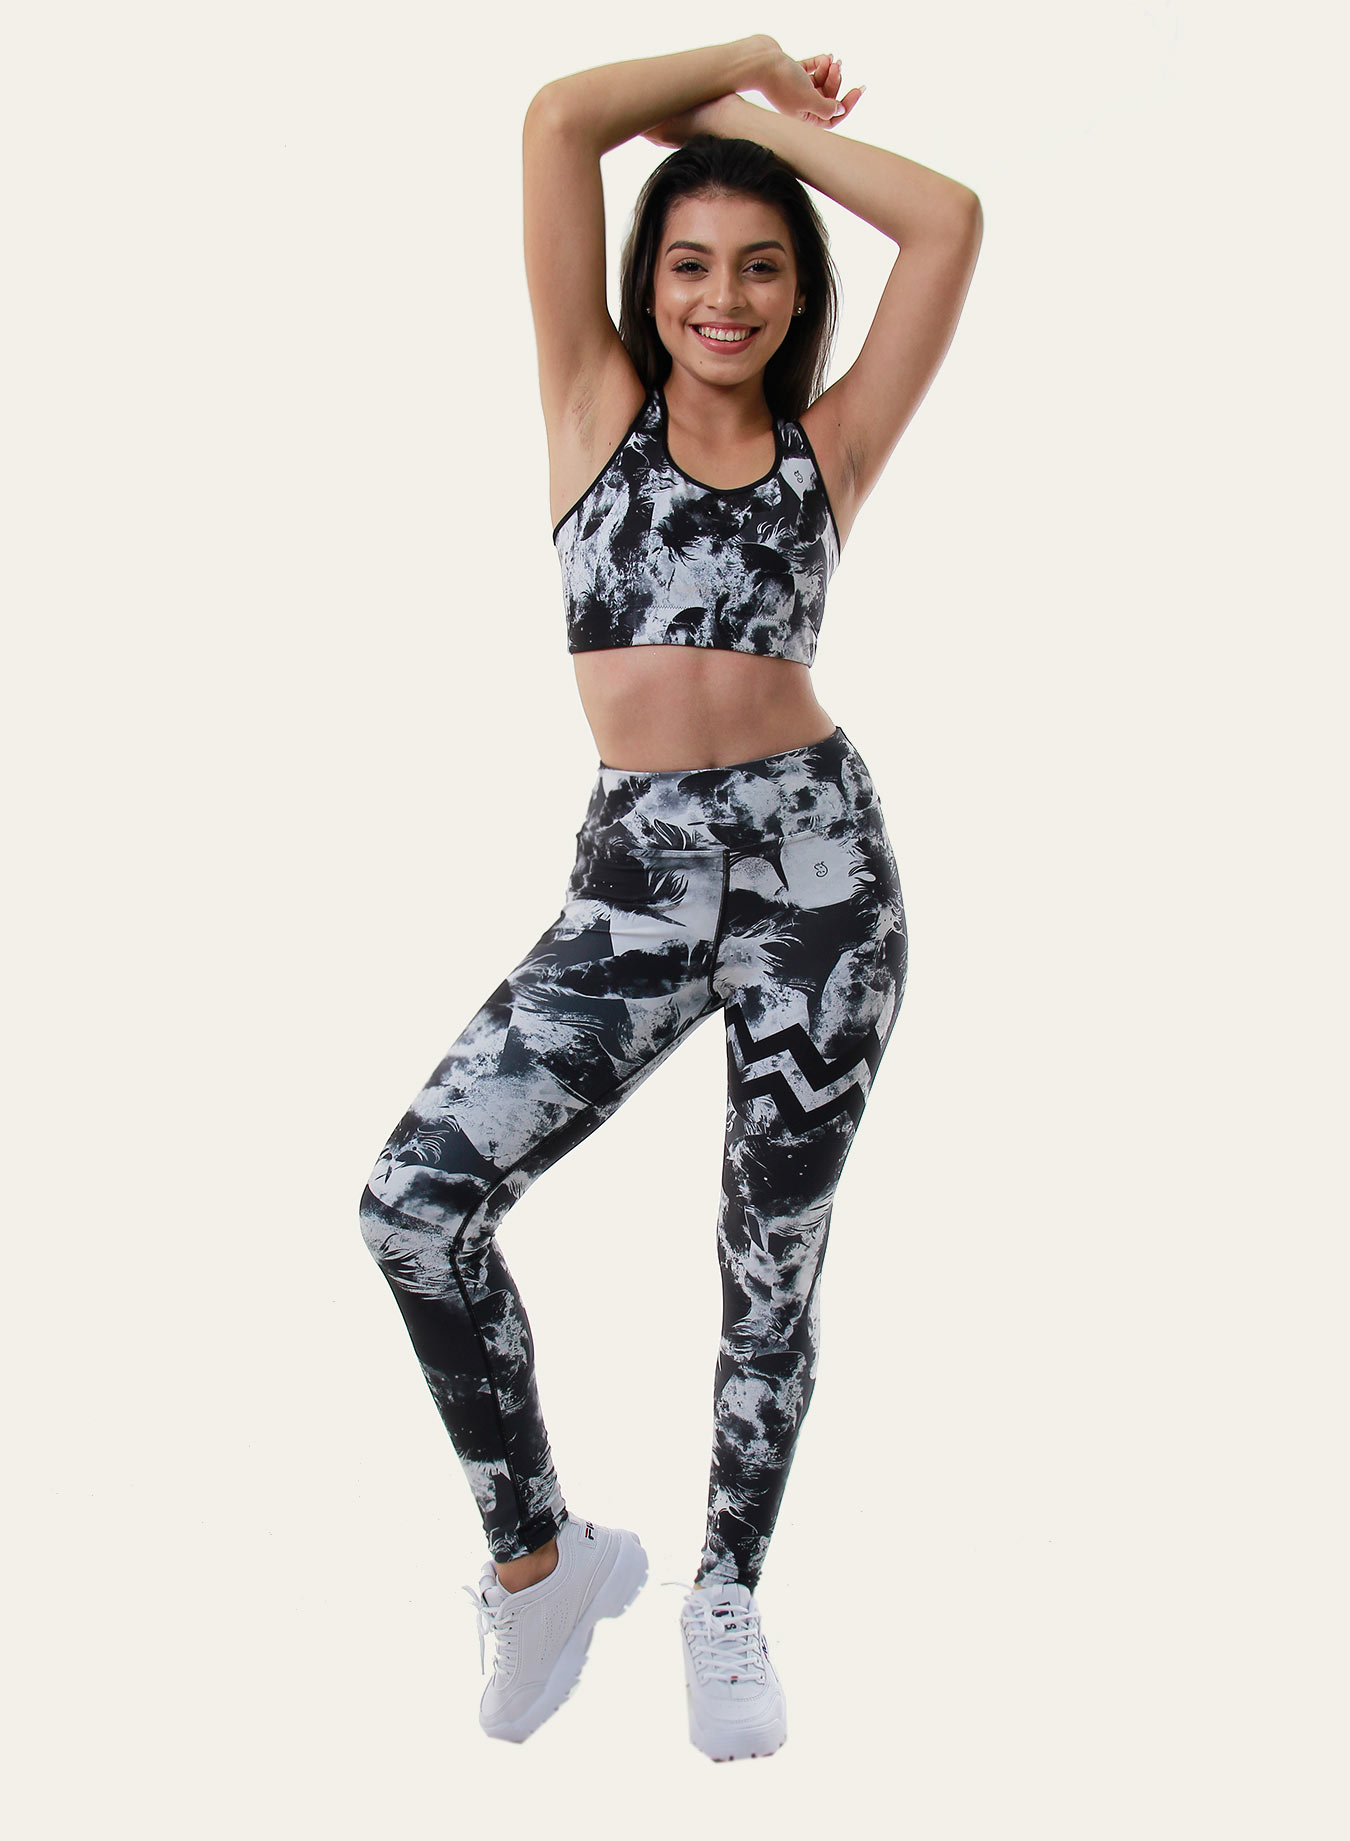 Jeune femme en legging de yoga Black feather